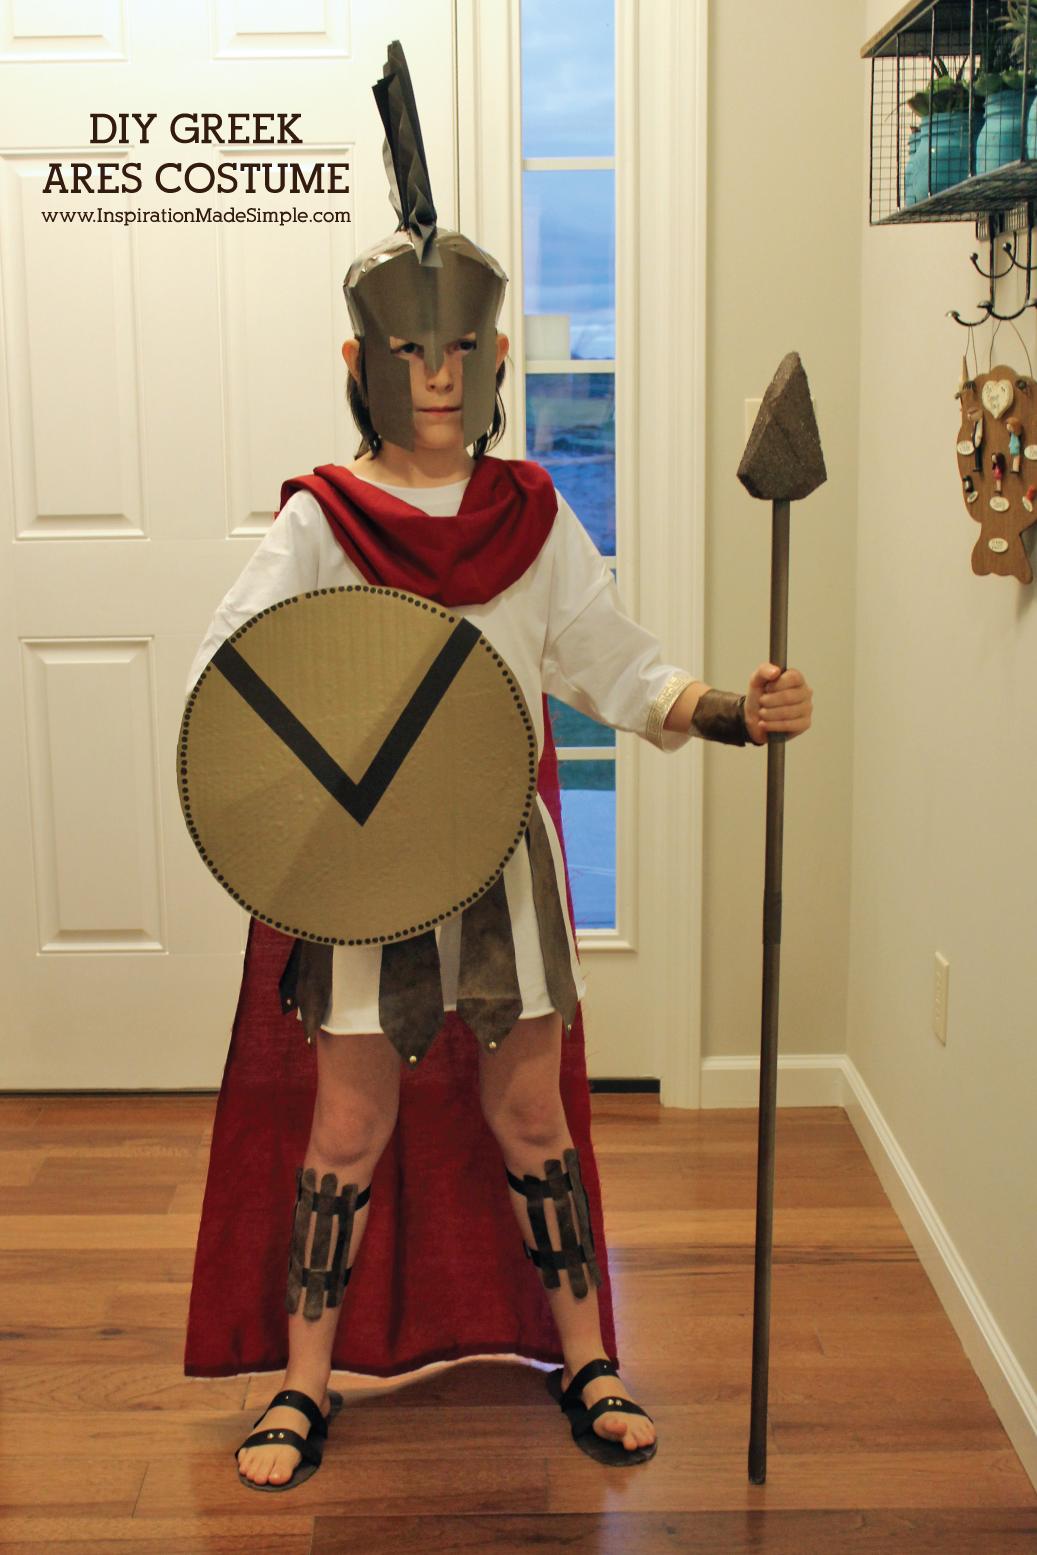 DIY Ares Greek Mythology Costume & DIY Ares Greek Mythology Costume | Pinterest | Greek mythology ...